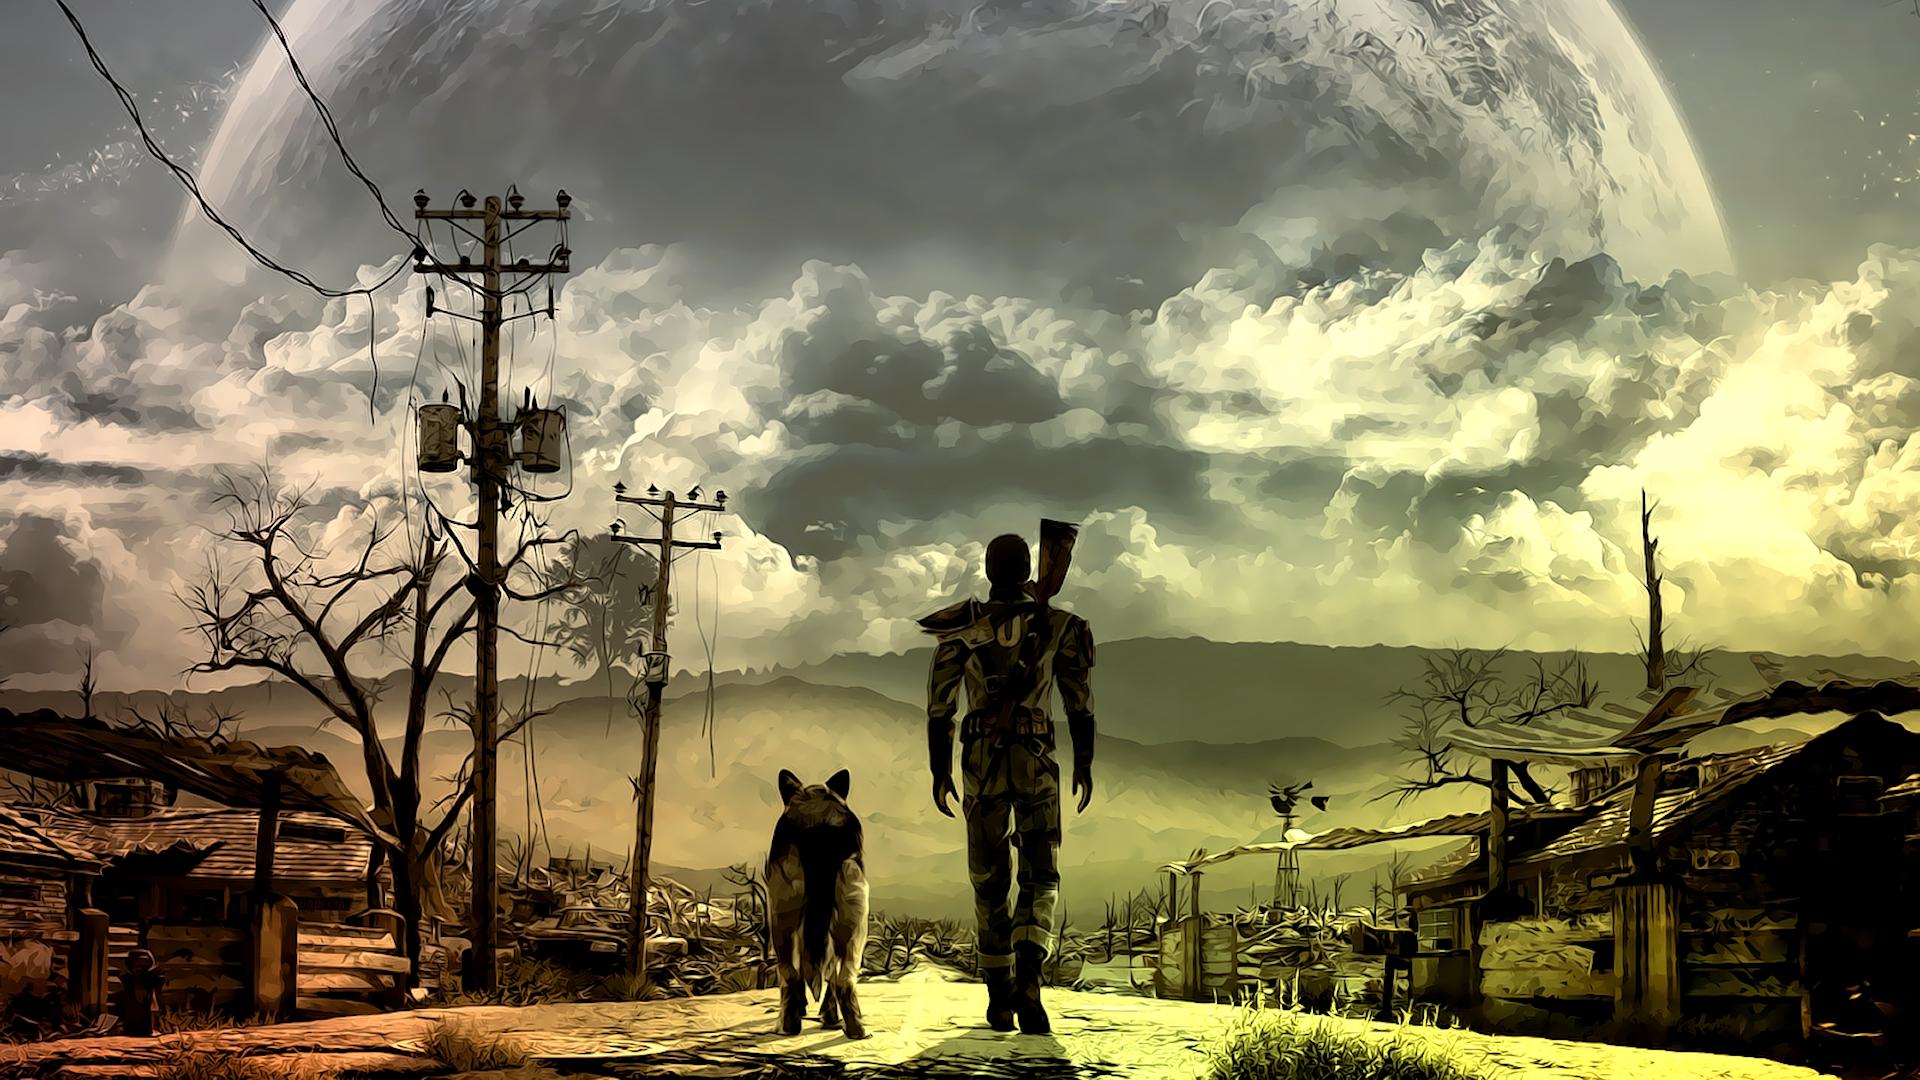 Fallout 3 Fonds dcran Arrires plan 1920x1080 ID324425 1920x1080